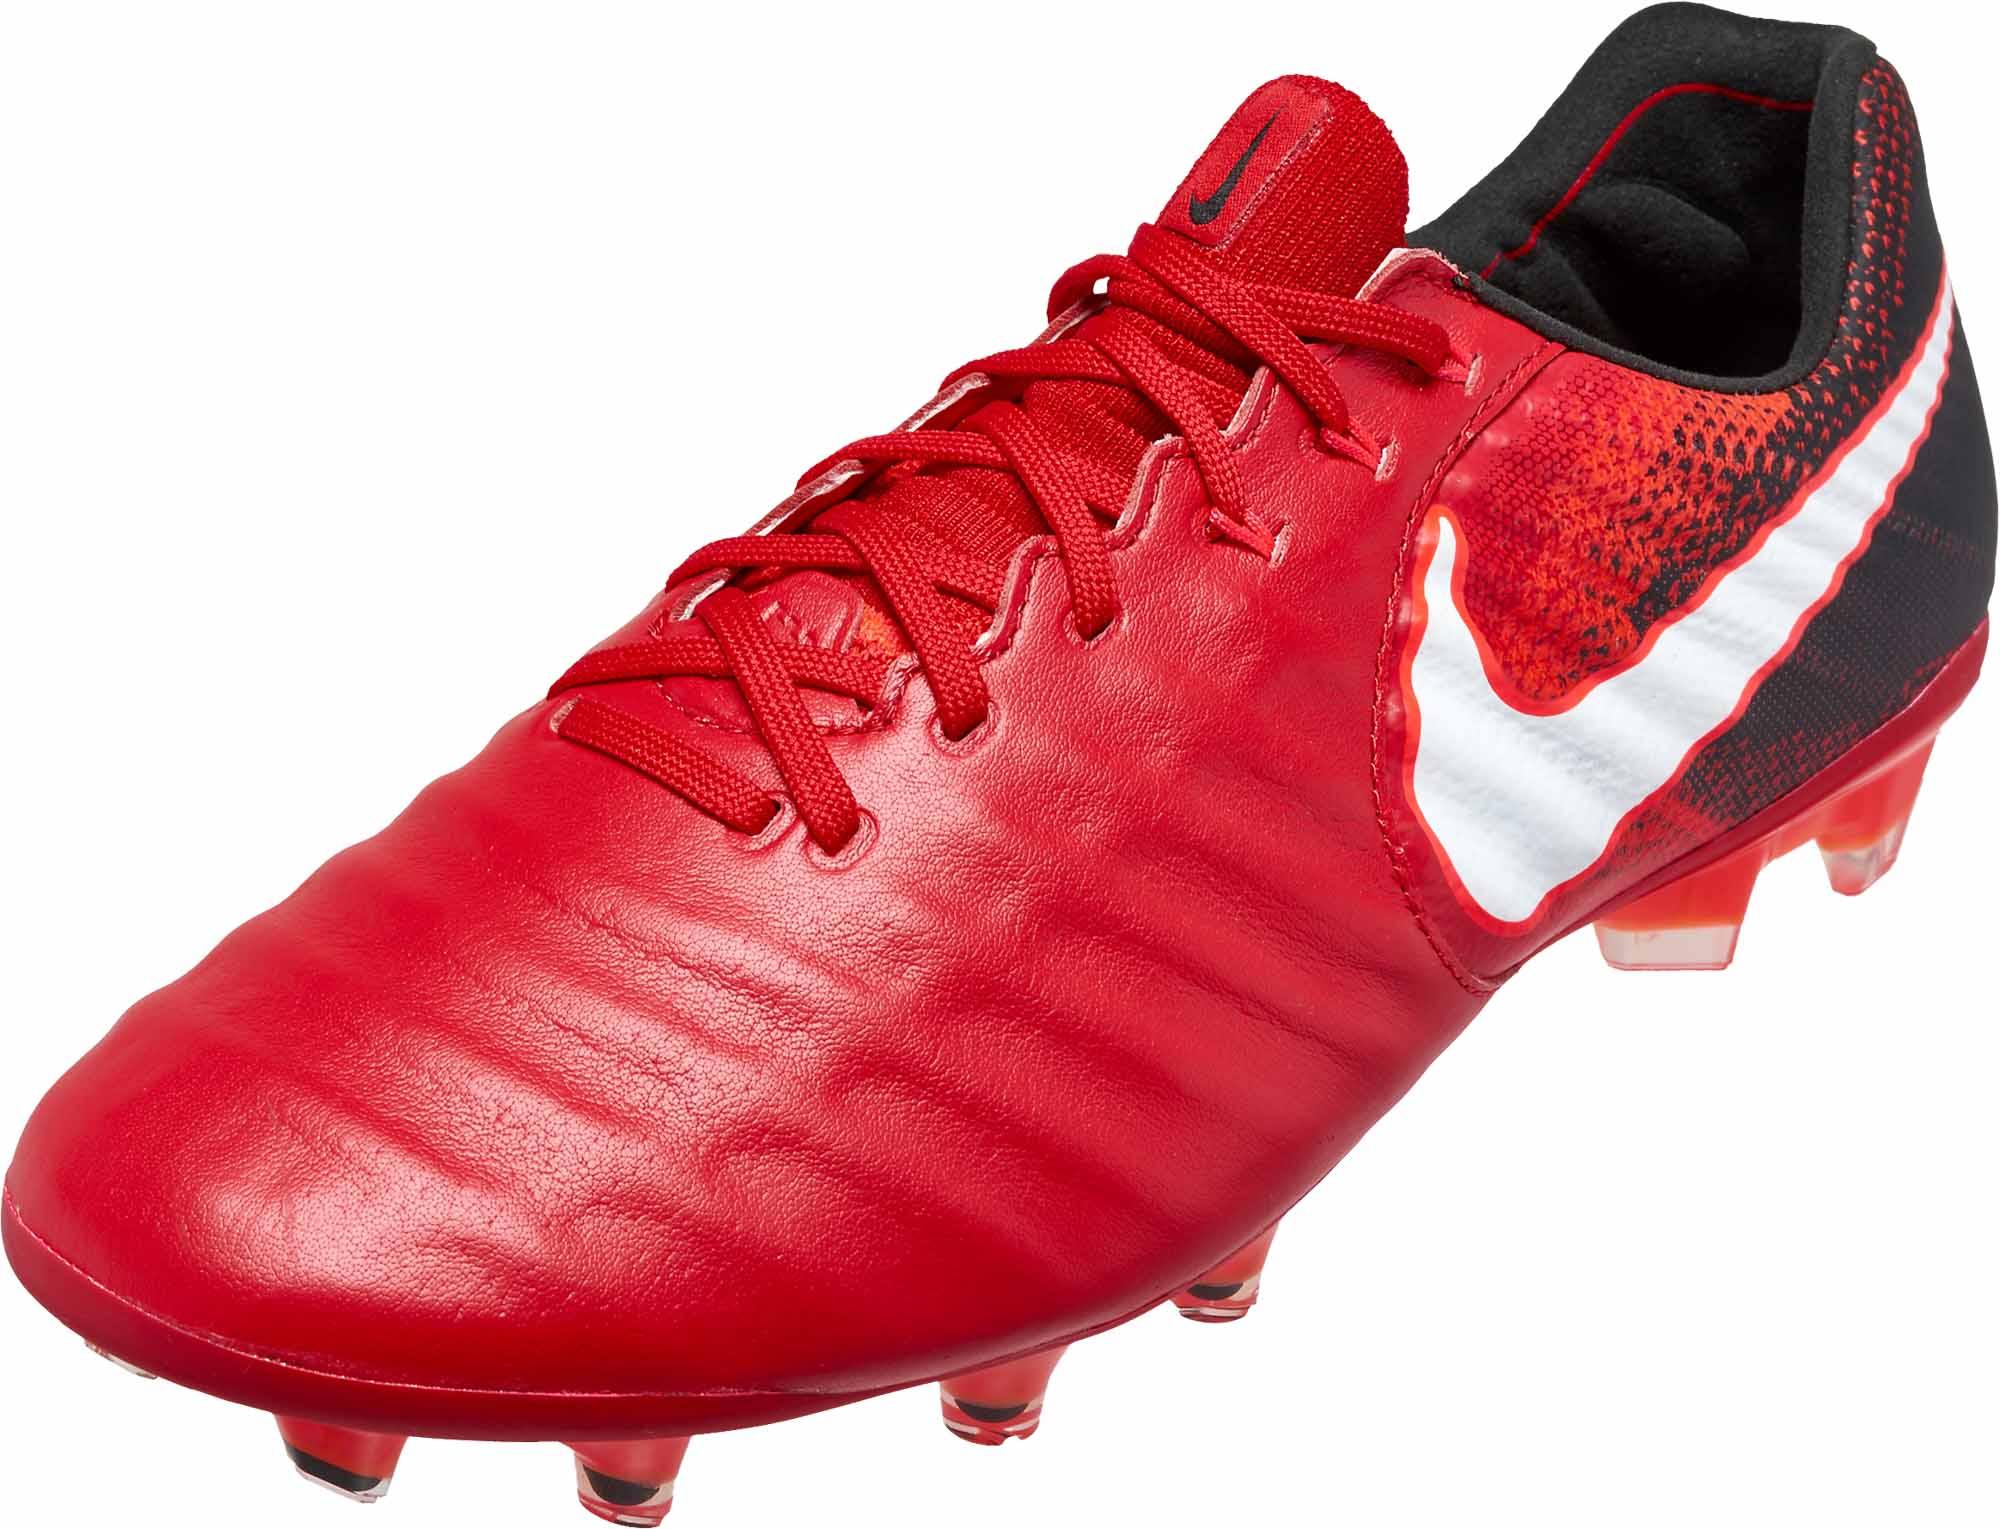 0bc6a51d7 Nike Tiempo Legend VII FG - University Red   White